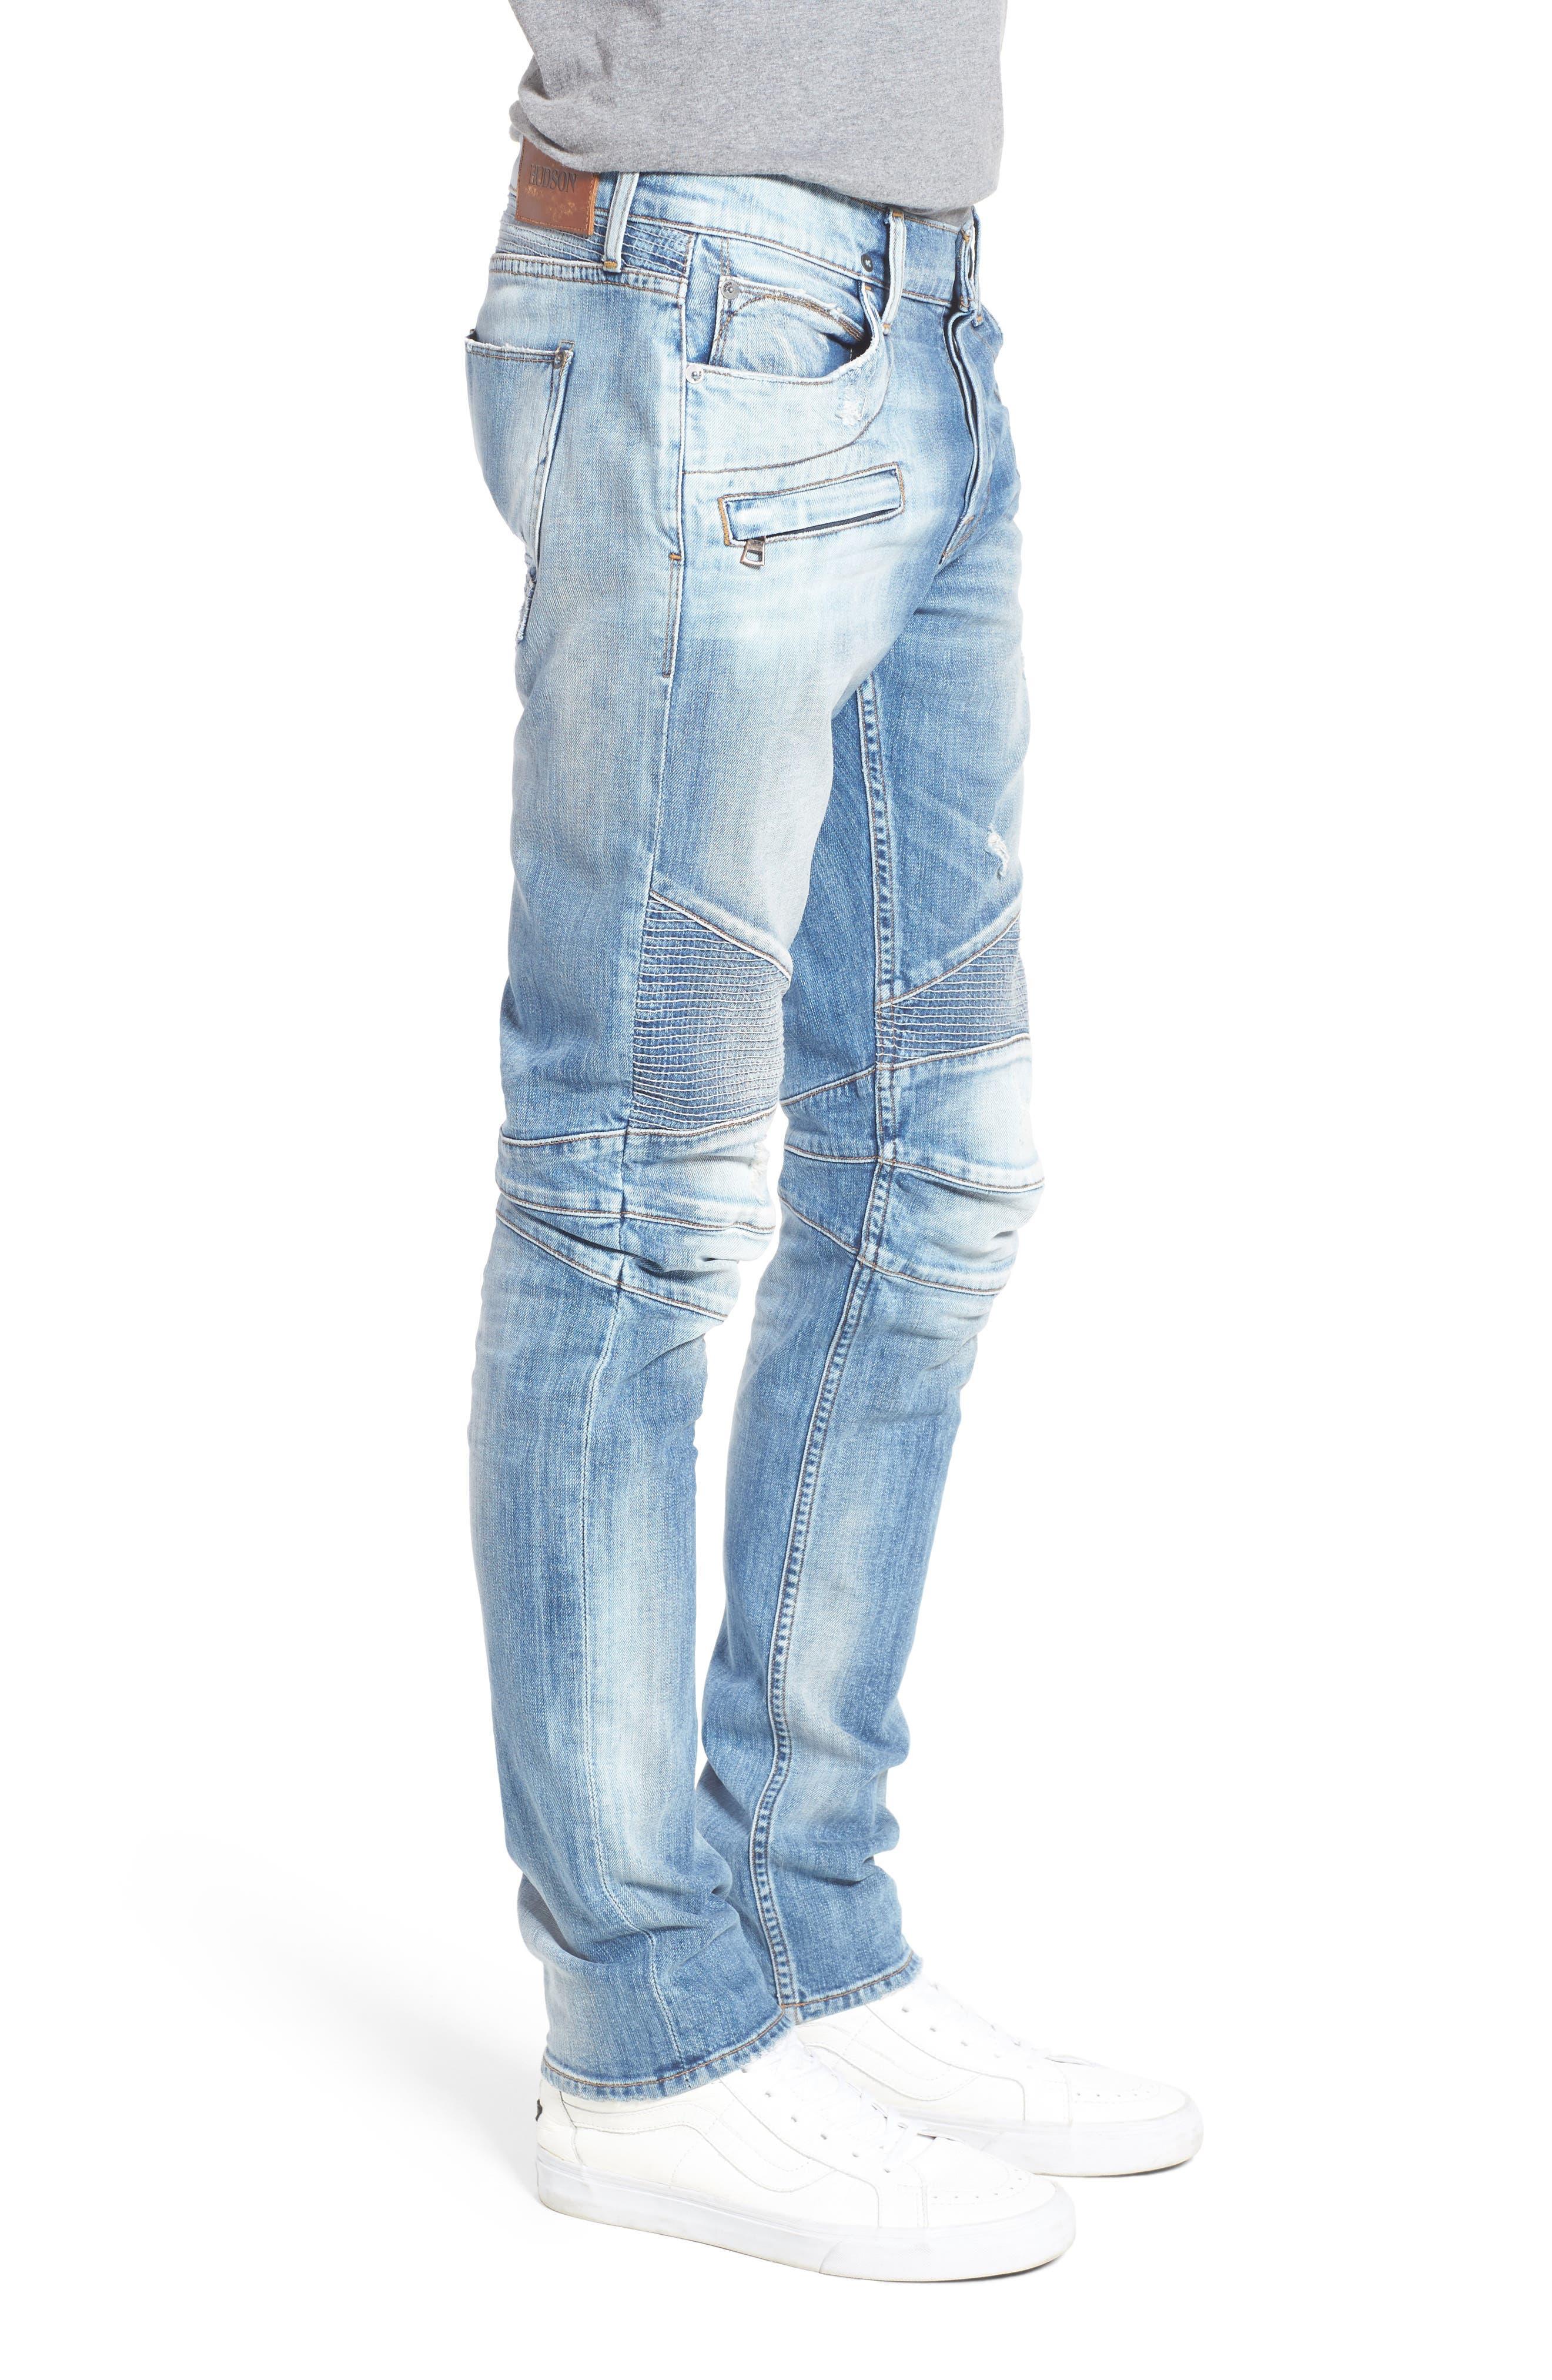 Blinder Skinny Fit Moto Jeans,                             Alternate thumbnail 3, color,                             429